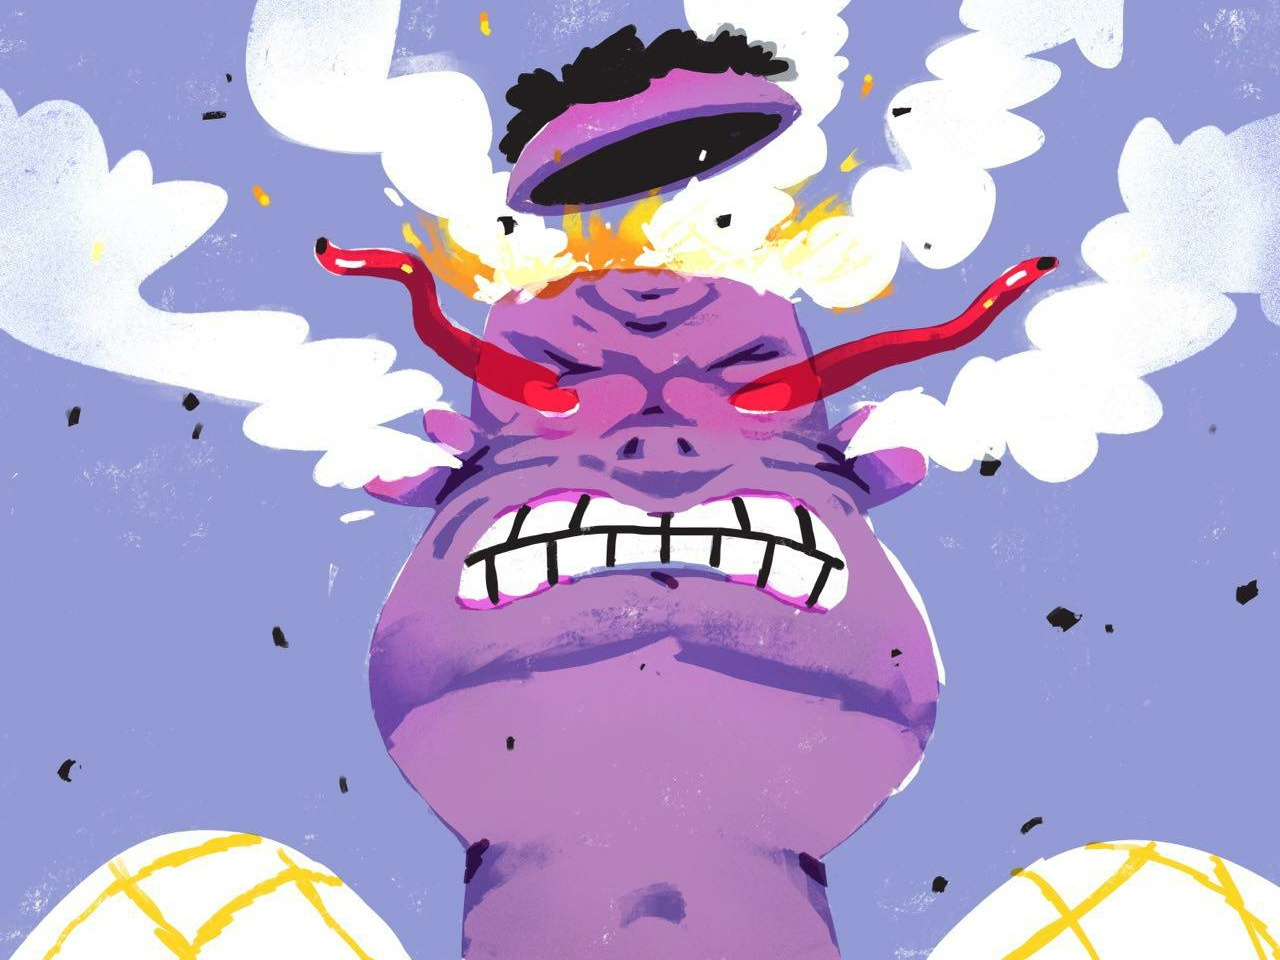 Anger sketch challenge everyday art daily illustration mental emotion character rage fury anger poster illustration procreate editorial illustration hand drawn doodle design art illustration